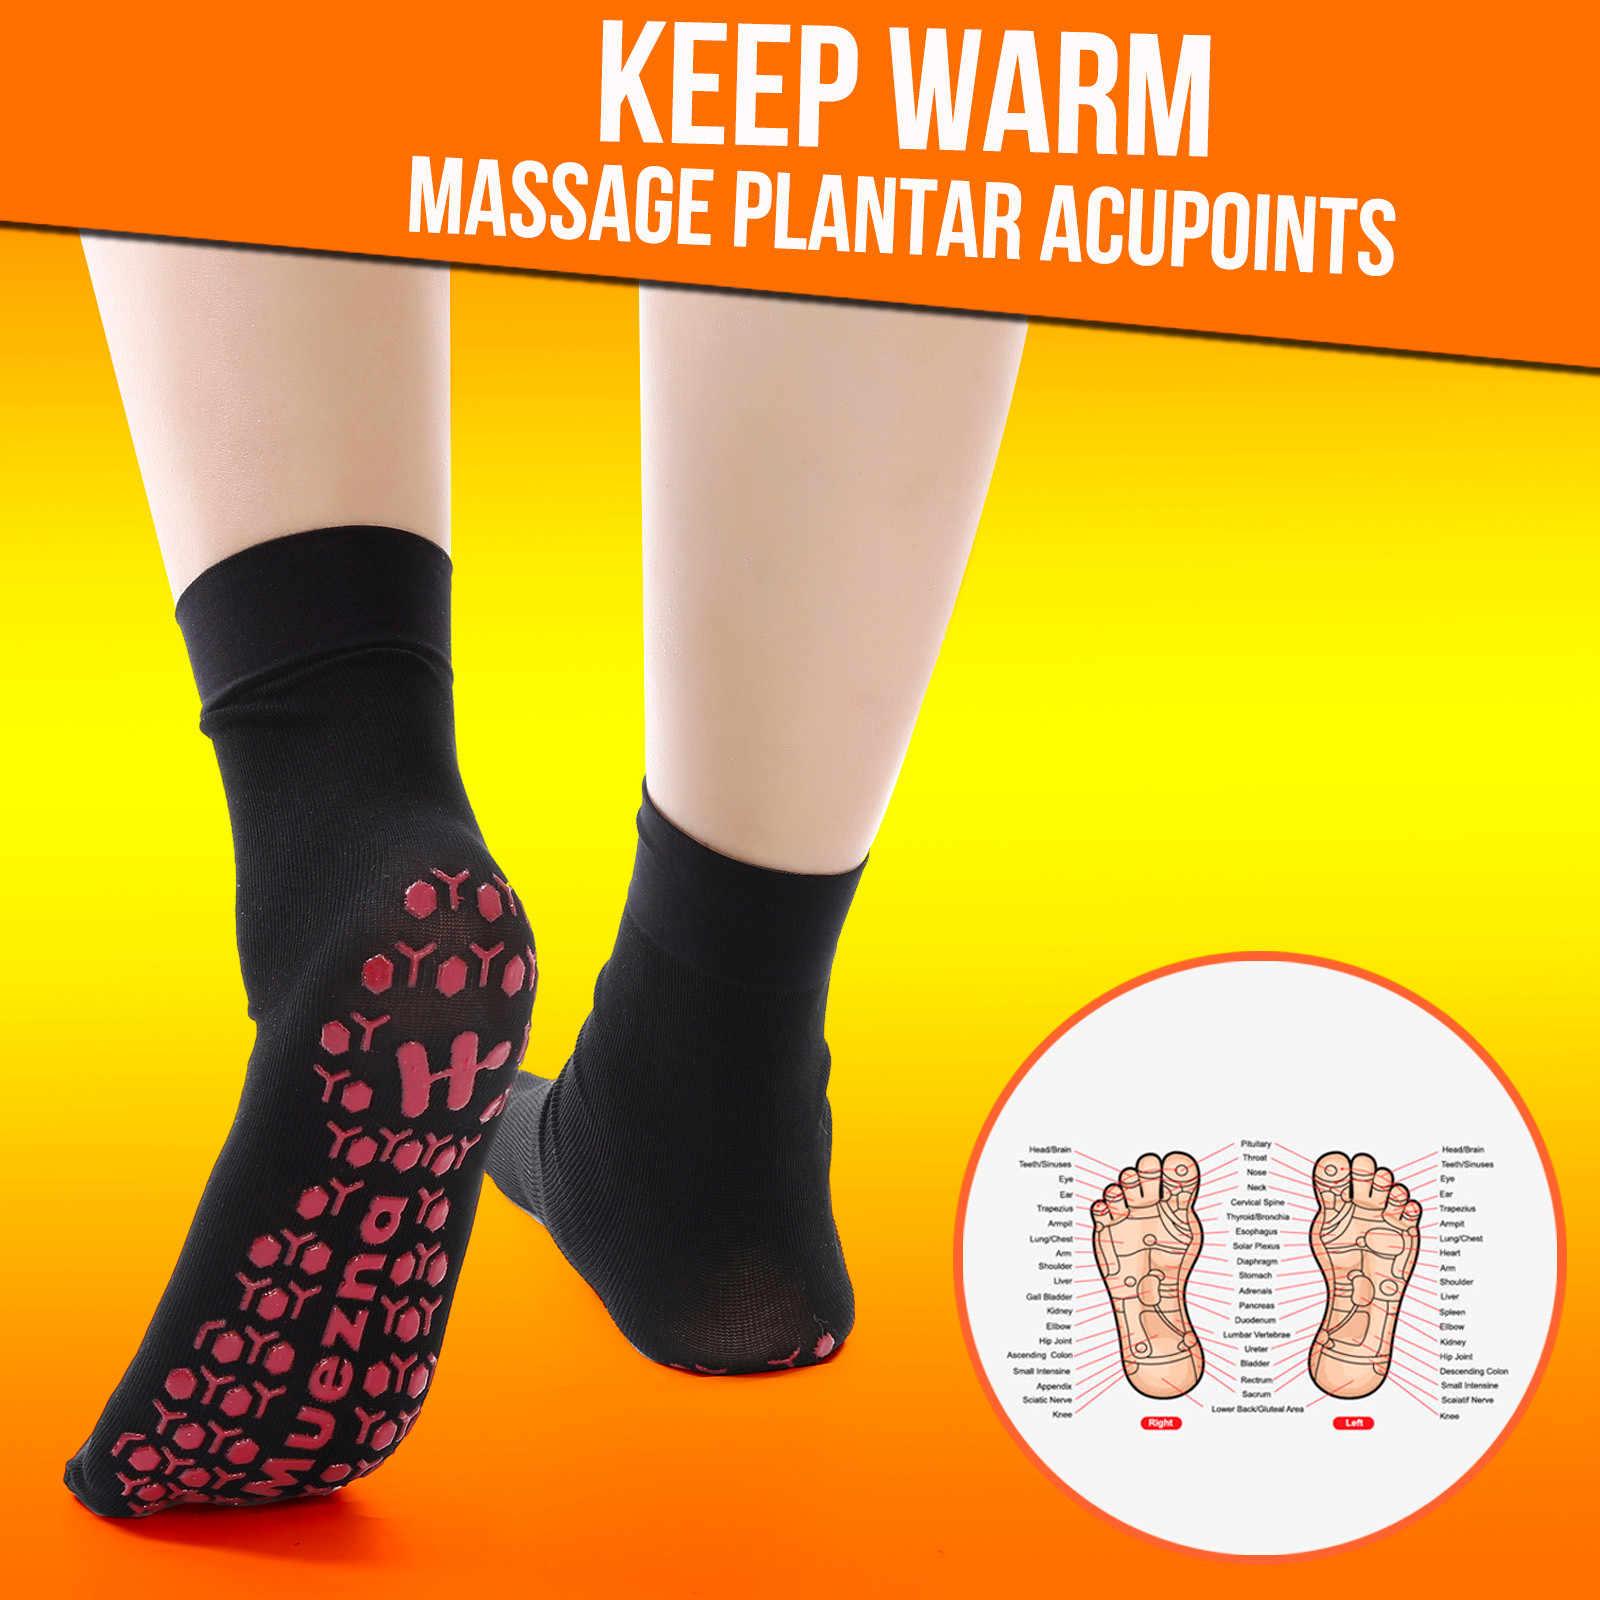 Zller2587 Aluminized Fiber Socks 35 Degree Thermal Insulation Socks Soft Comfort Winter Thermal Socks